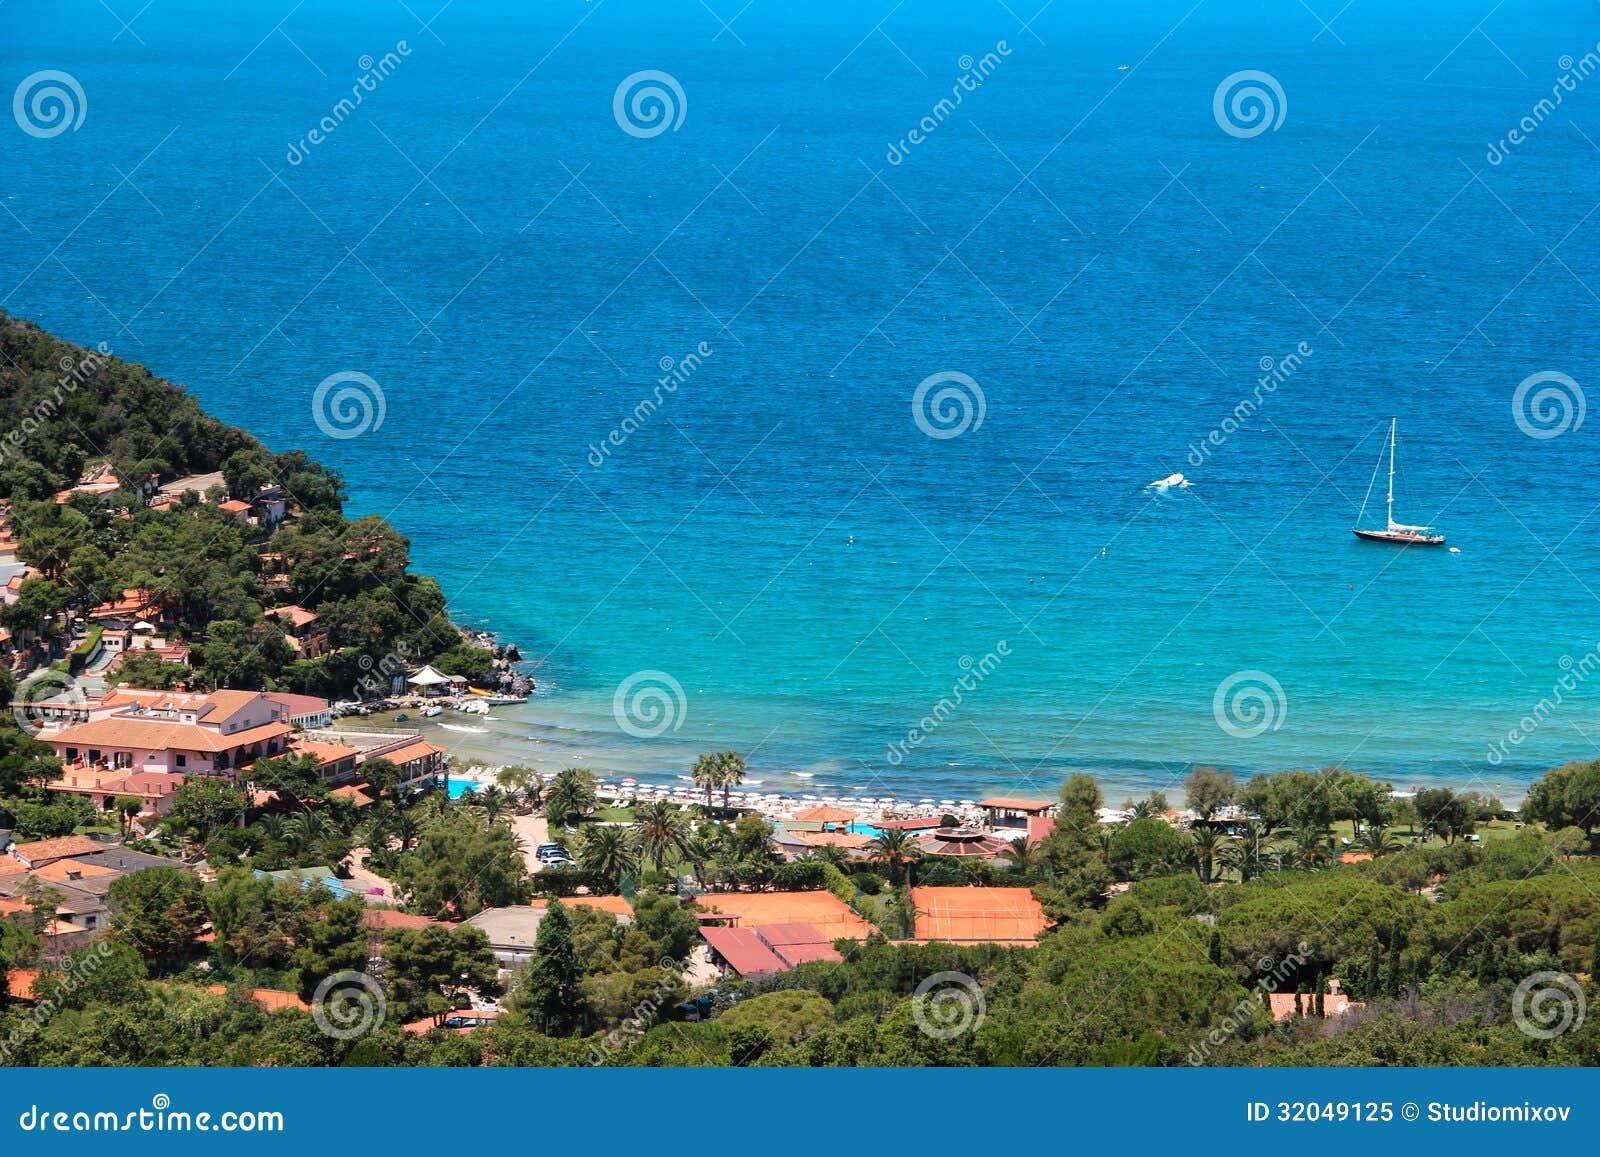 Procchio Italy  City pictures : La Biodola Beach, Procchio, Elba Island. Italy Royalty Free Stock ...